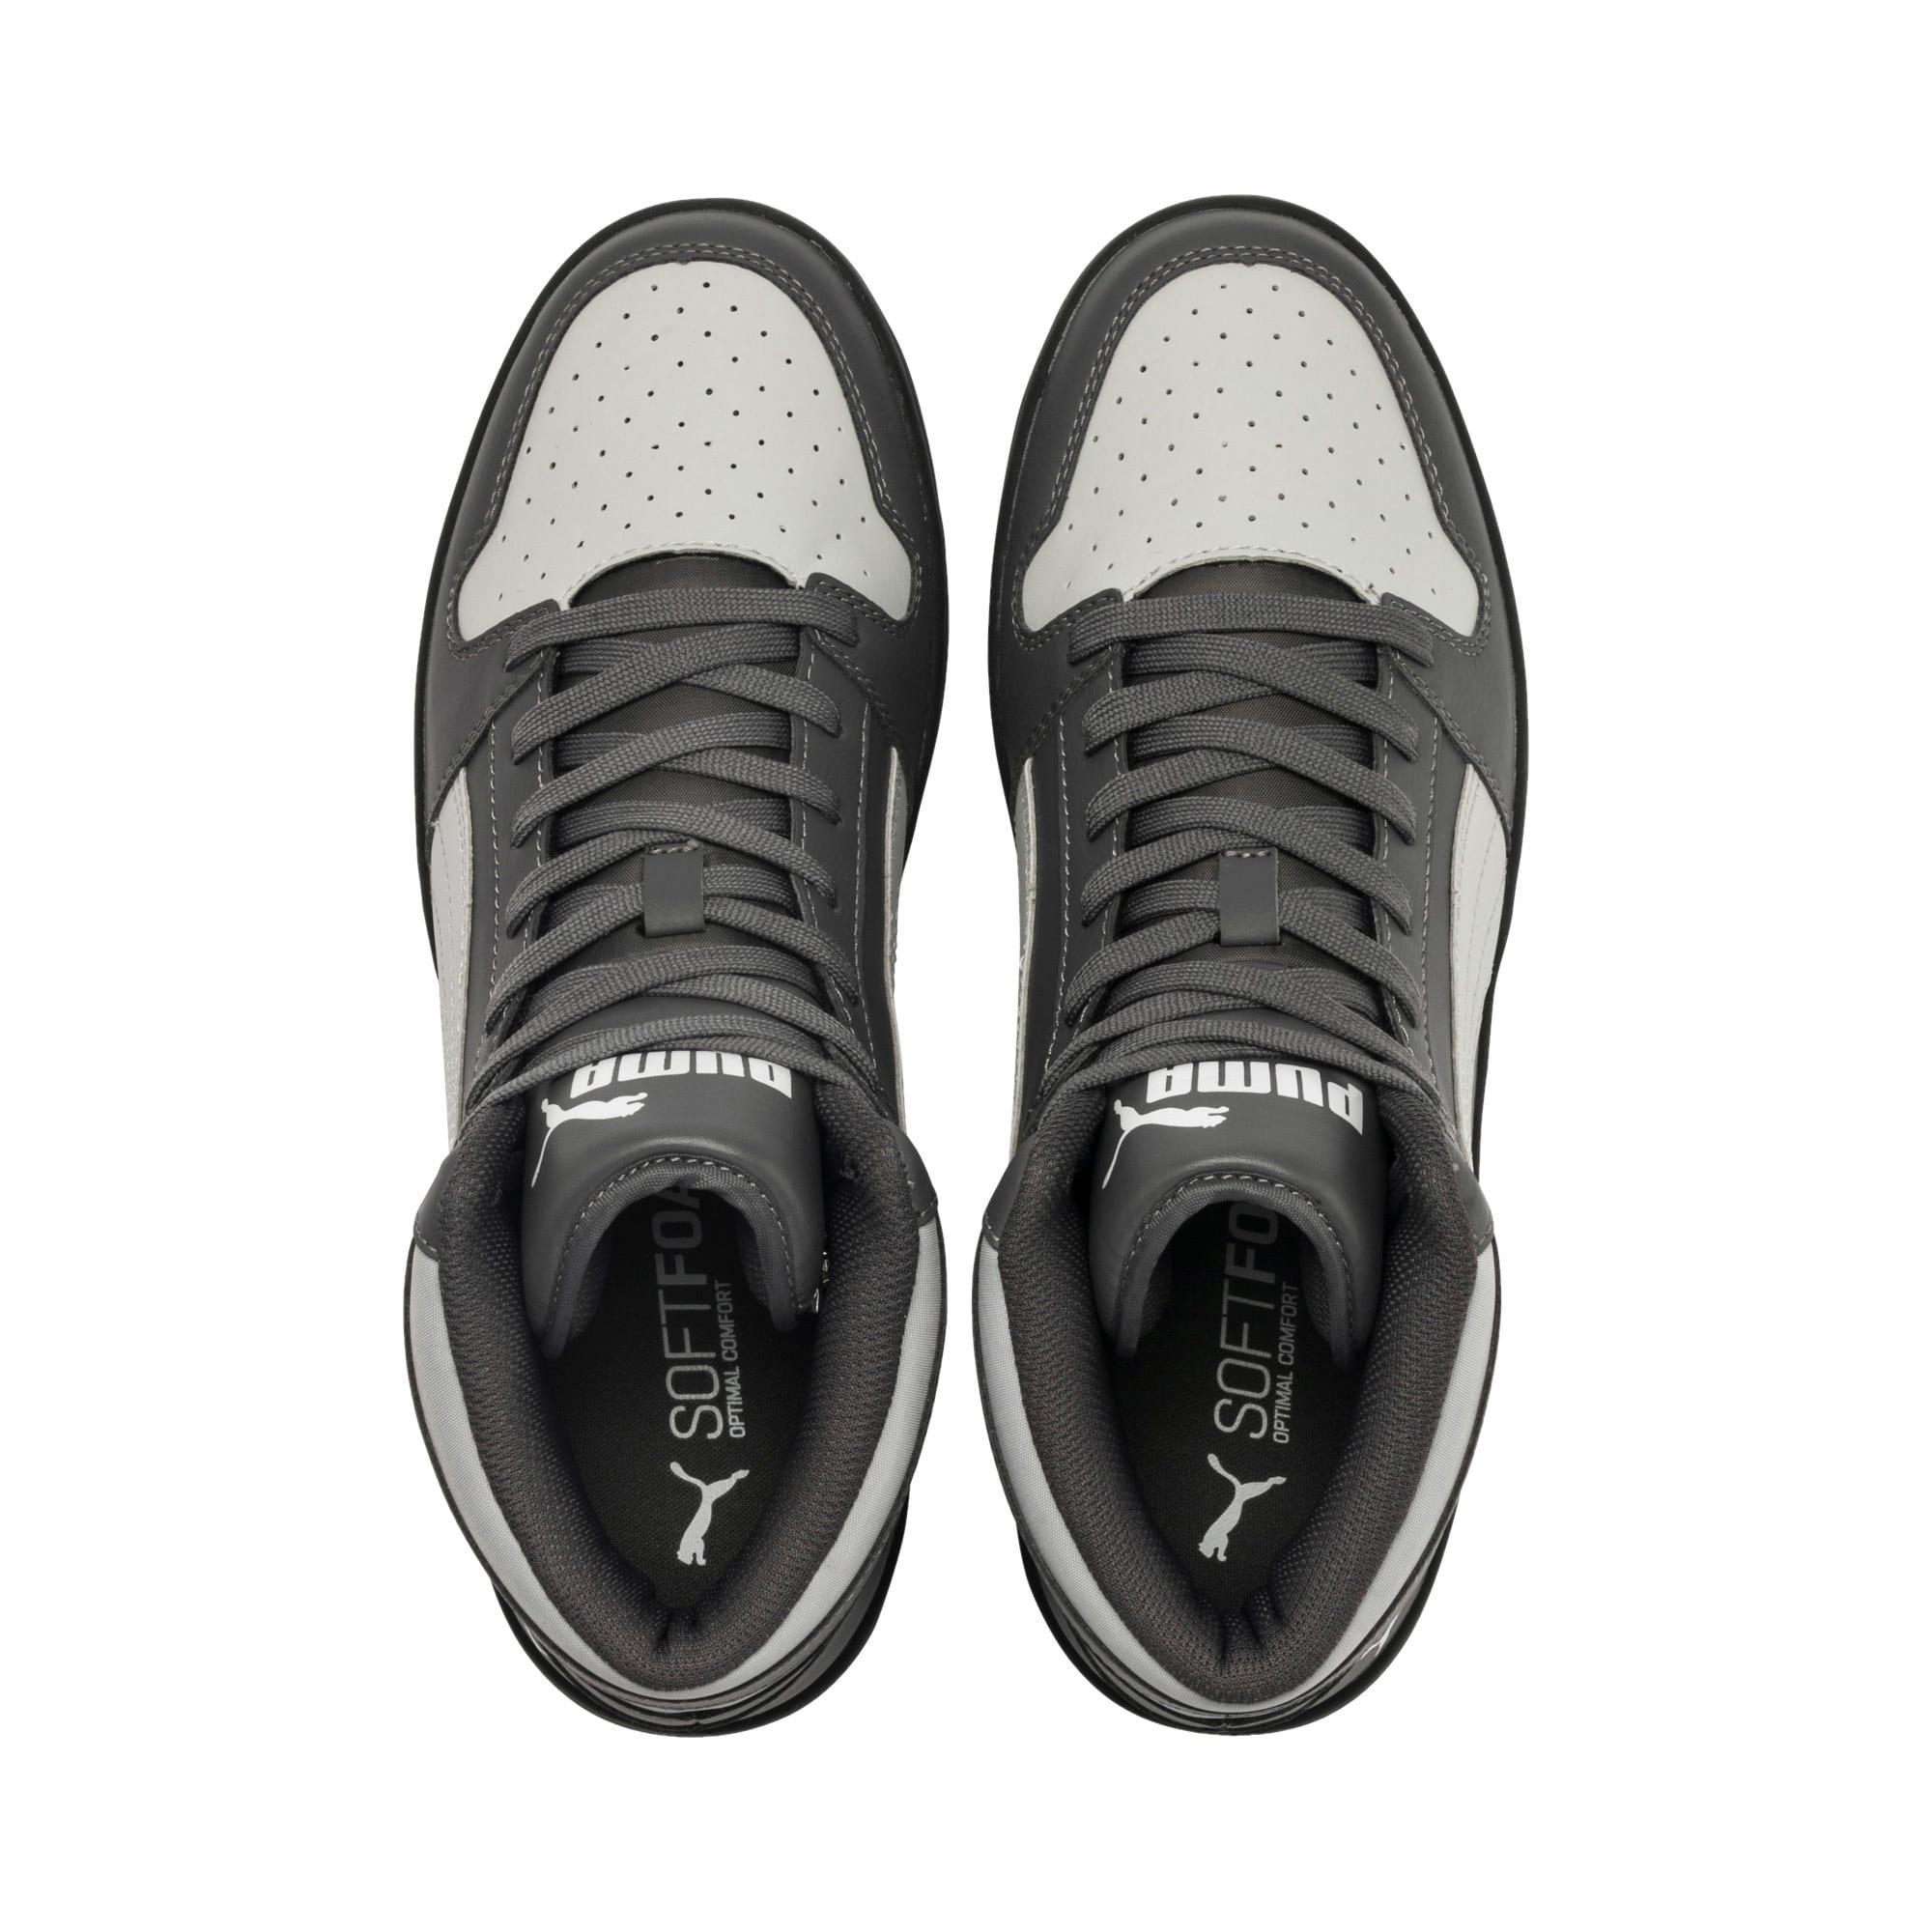 Thumbnail 7 of PUMA Rebound LayUp Sneakers, CASTLEROCK-HRise-White-Black, medium